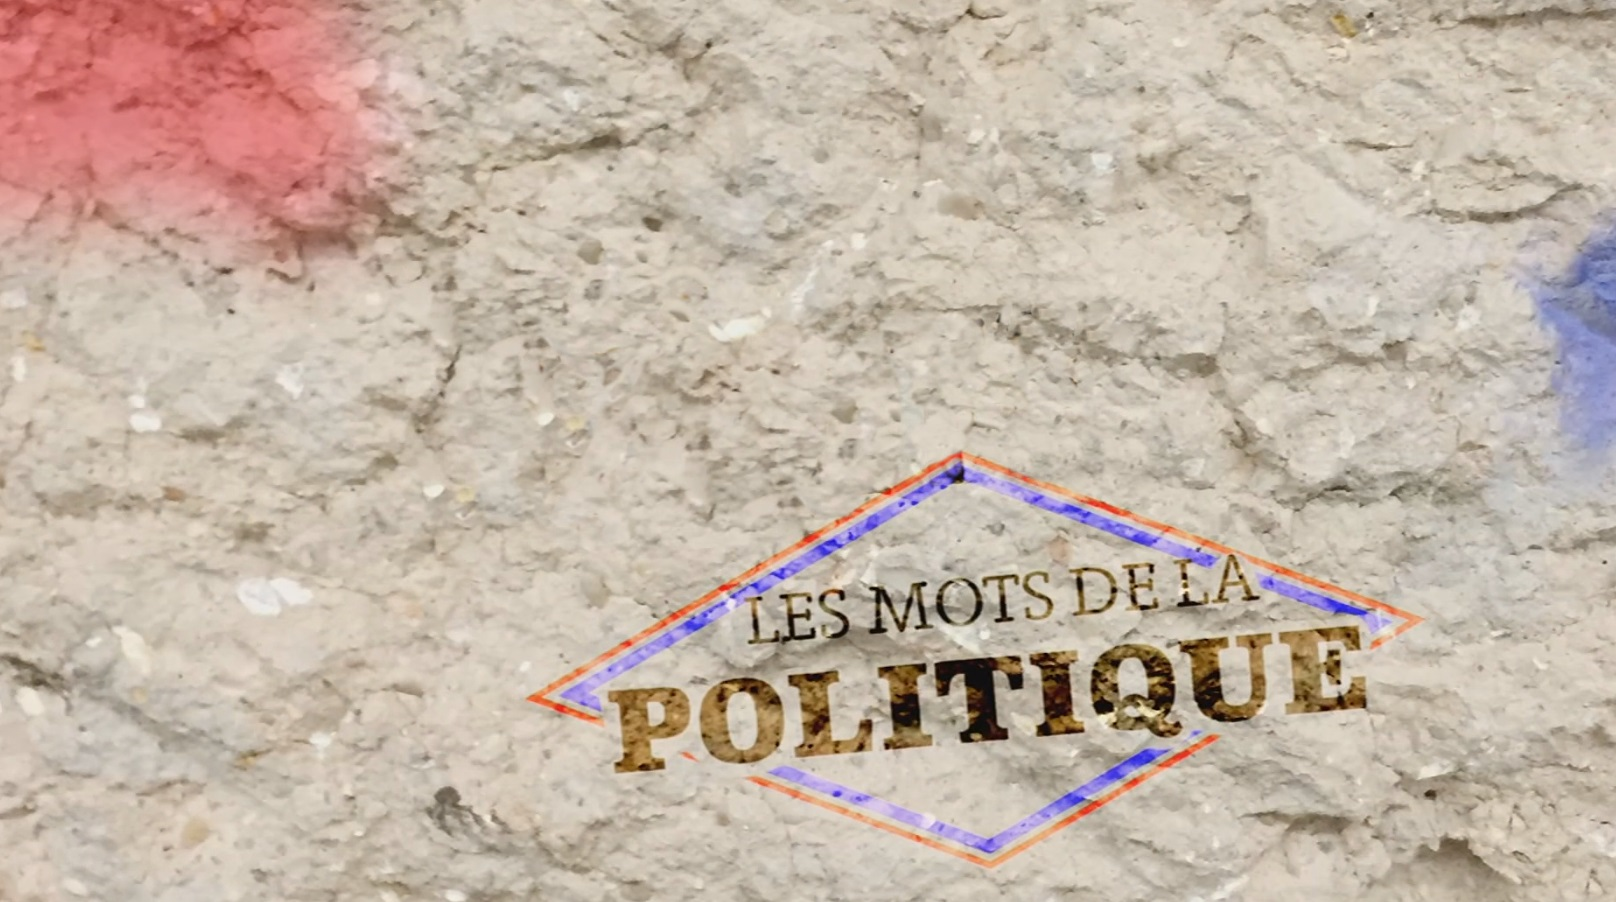 Les mots de la politique